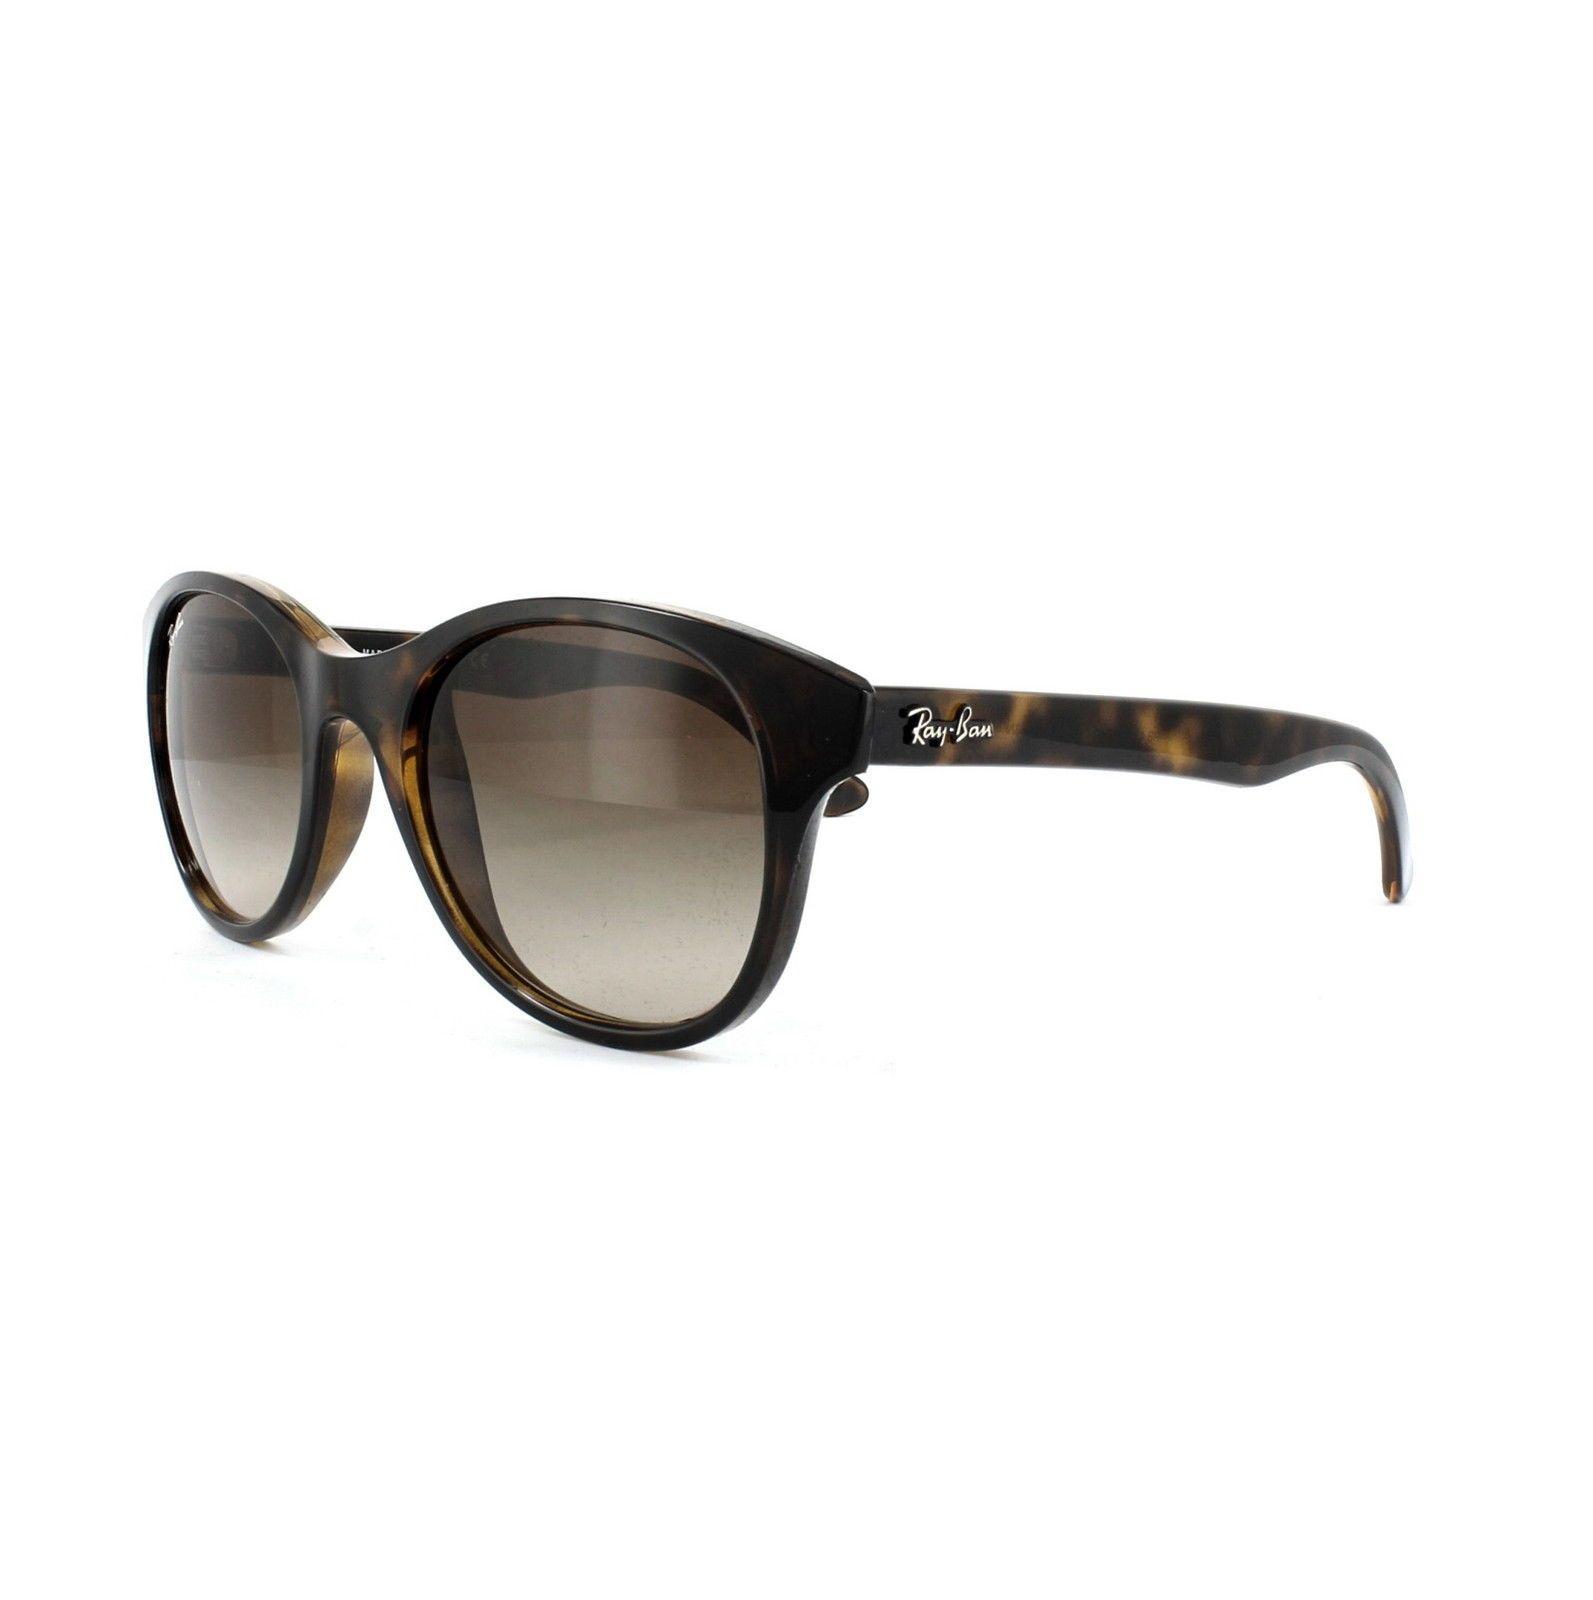 a10c566a21ee Ray-Ban Sunglasses 4203 710 13 Havana Brown Gradient